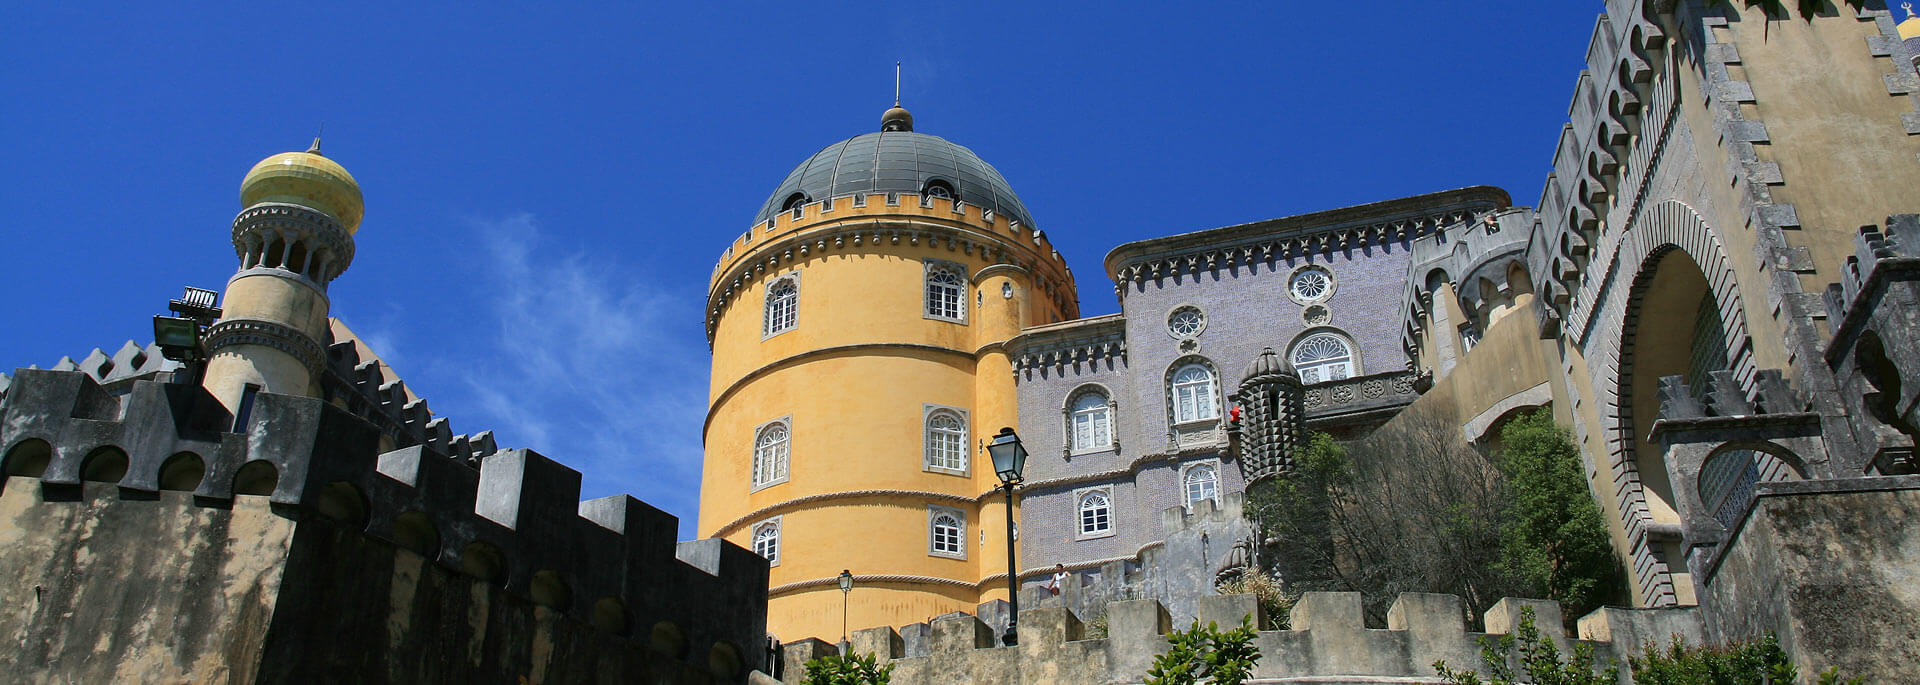 Ausflug zum Palacio da Pena in Sintra